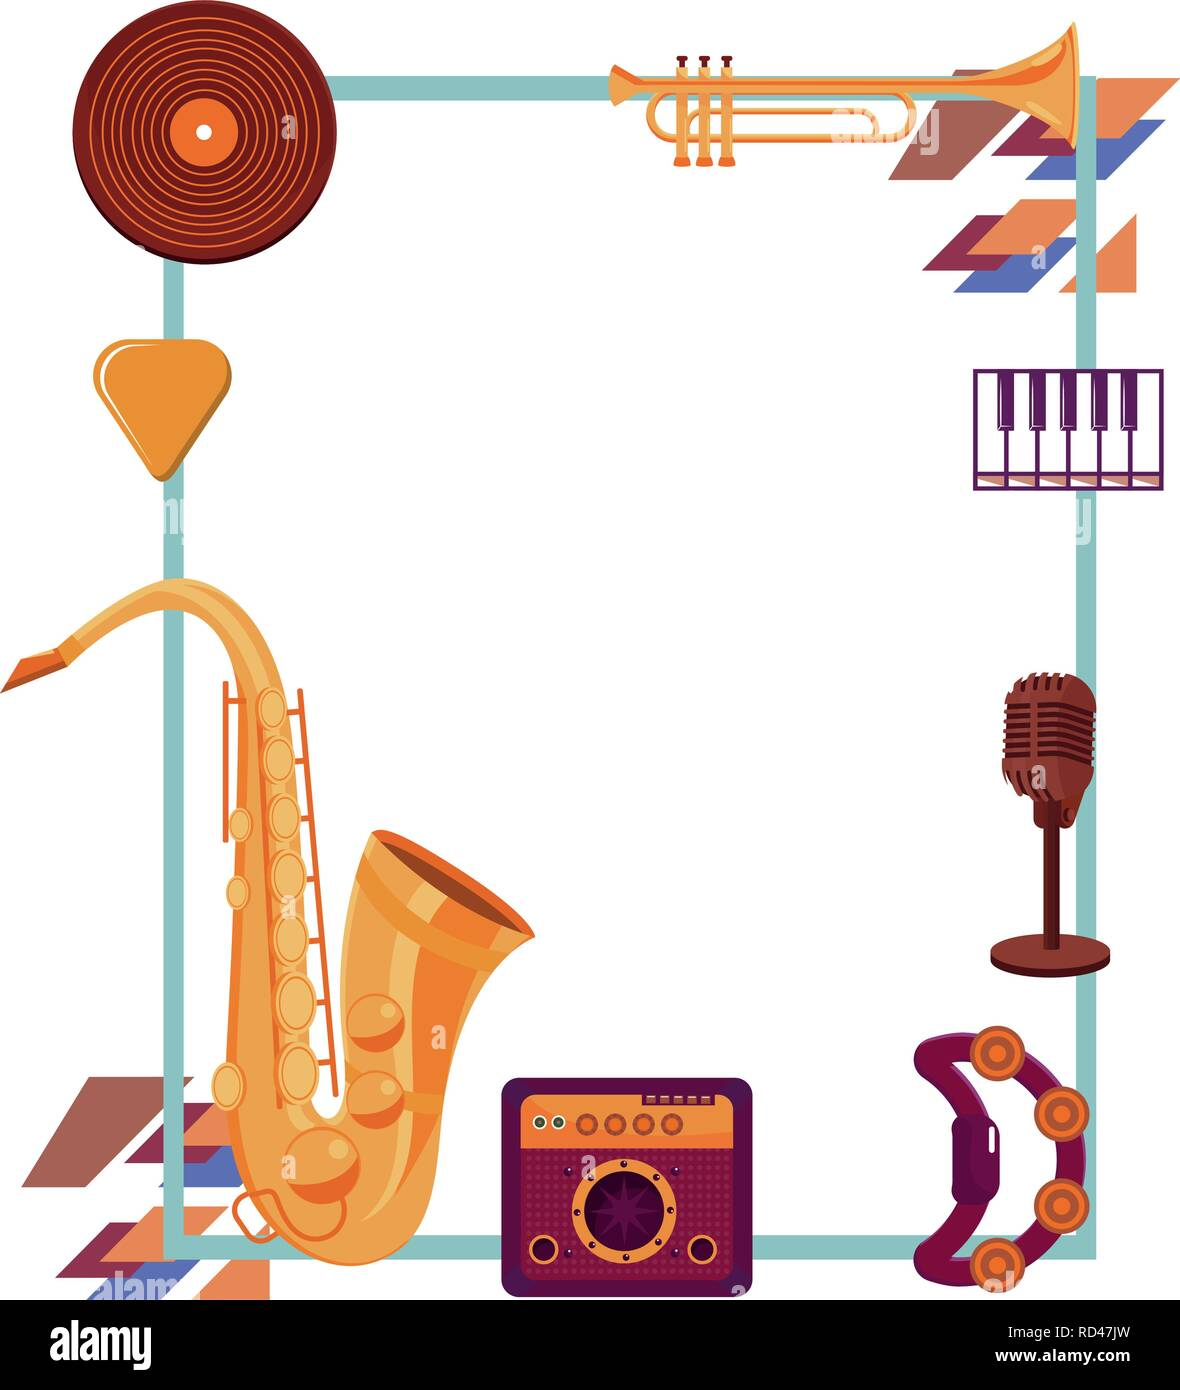 instruments frame design Stock Vector Art & Illustration